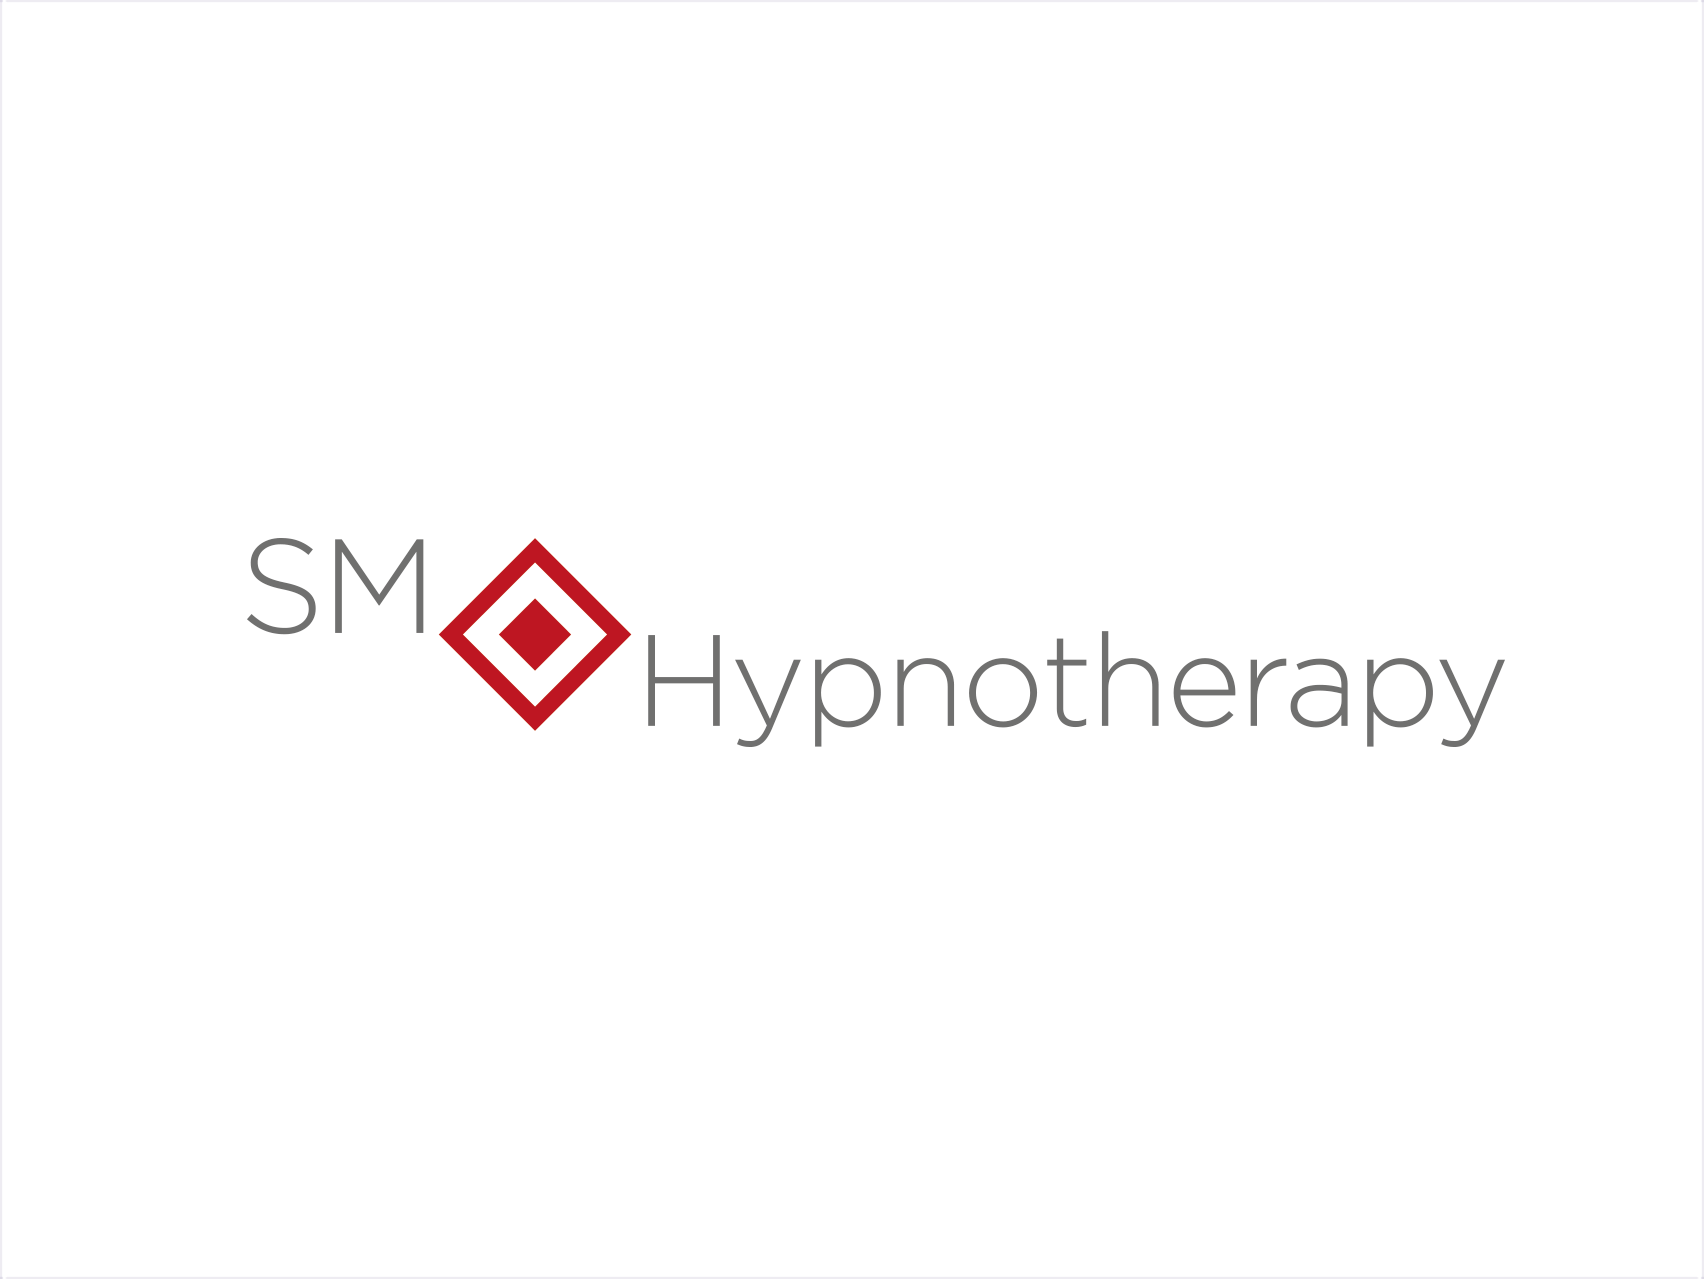 SM Hypnotherapy logo design